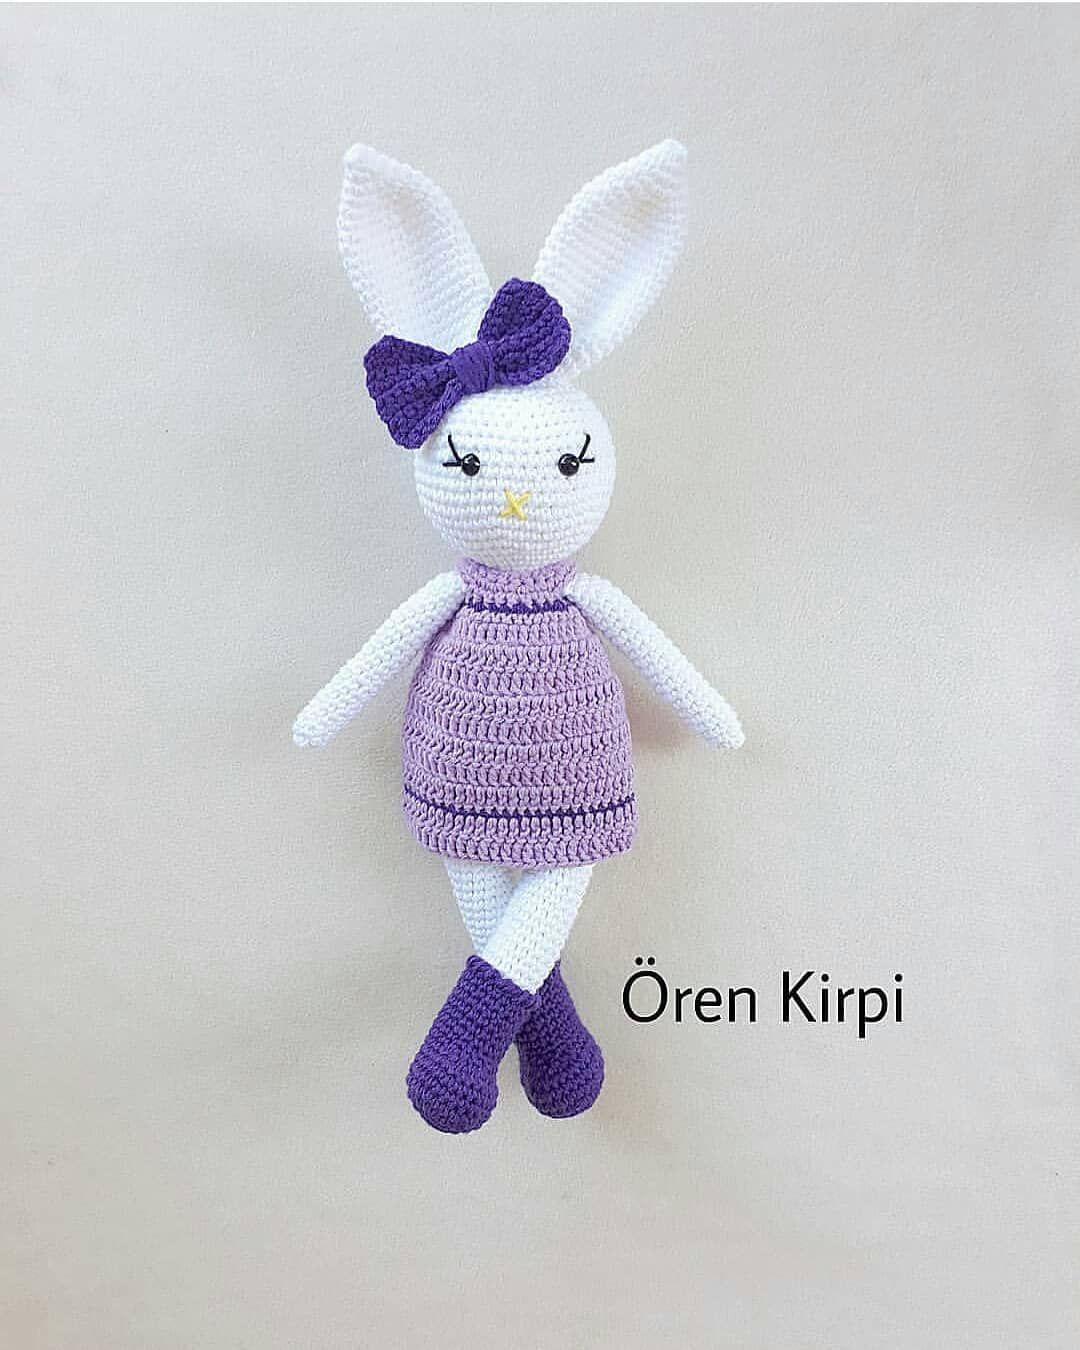 Kartopu Baby Natural Baby Yarn, Beige - K1848 - Hobiumyarns | 1350x1080